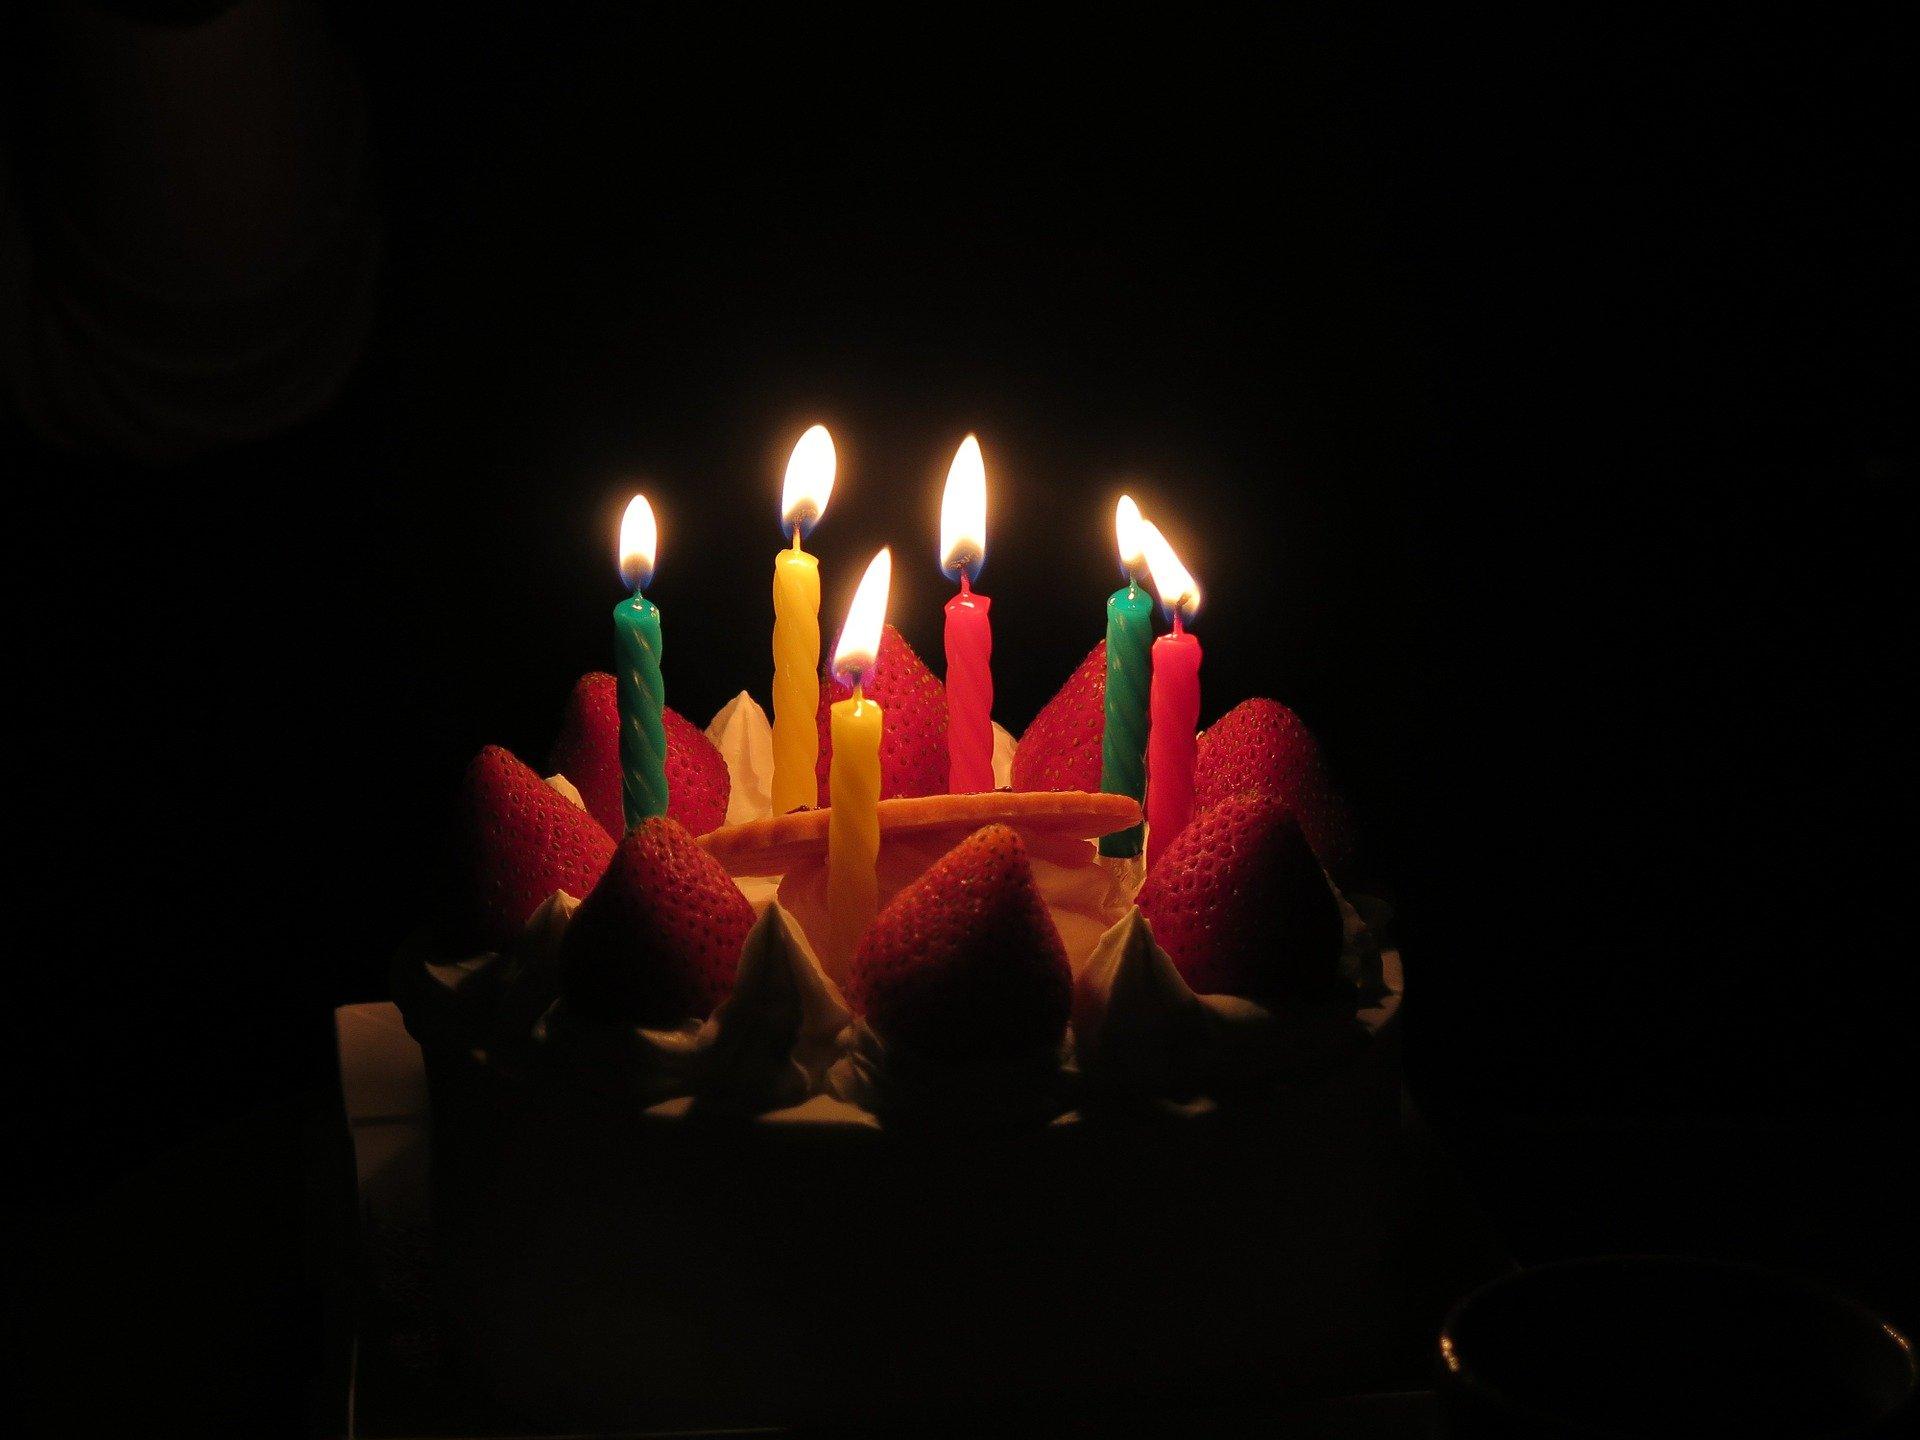 birthday-candles-579117_1920